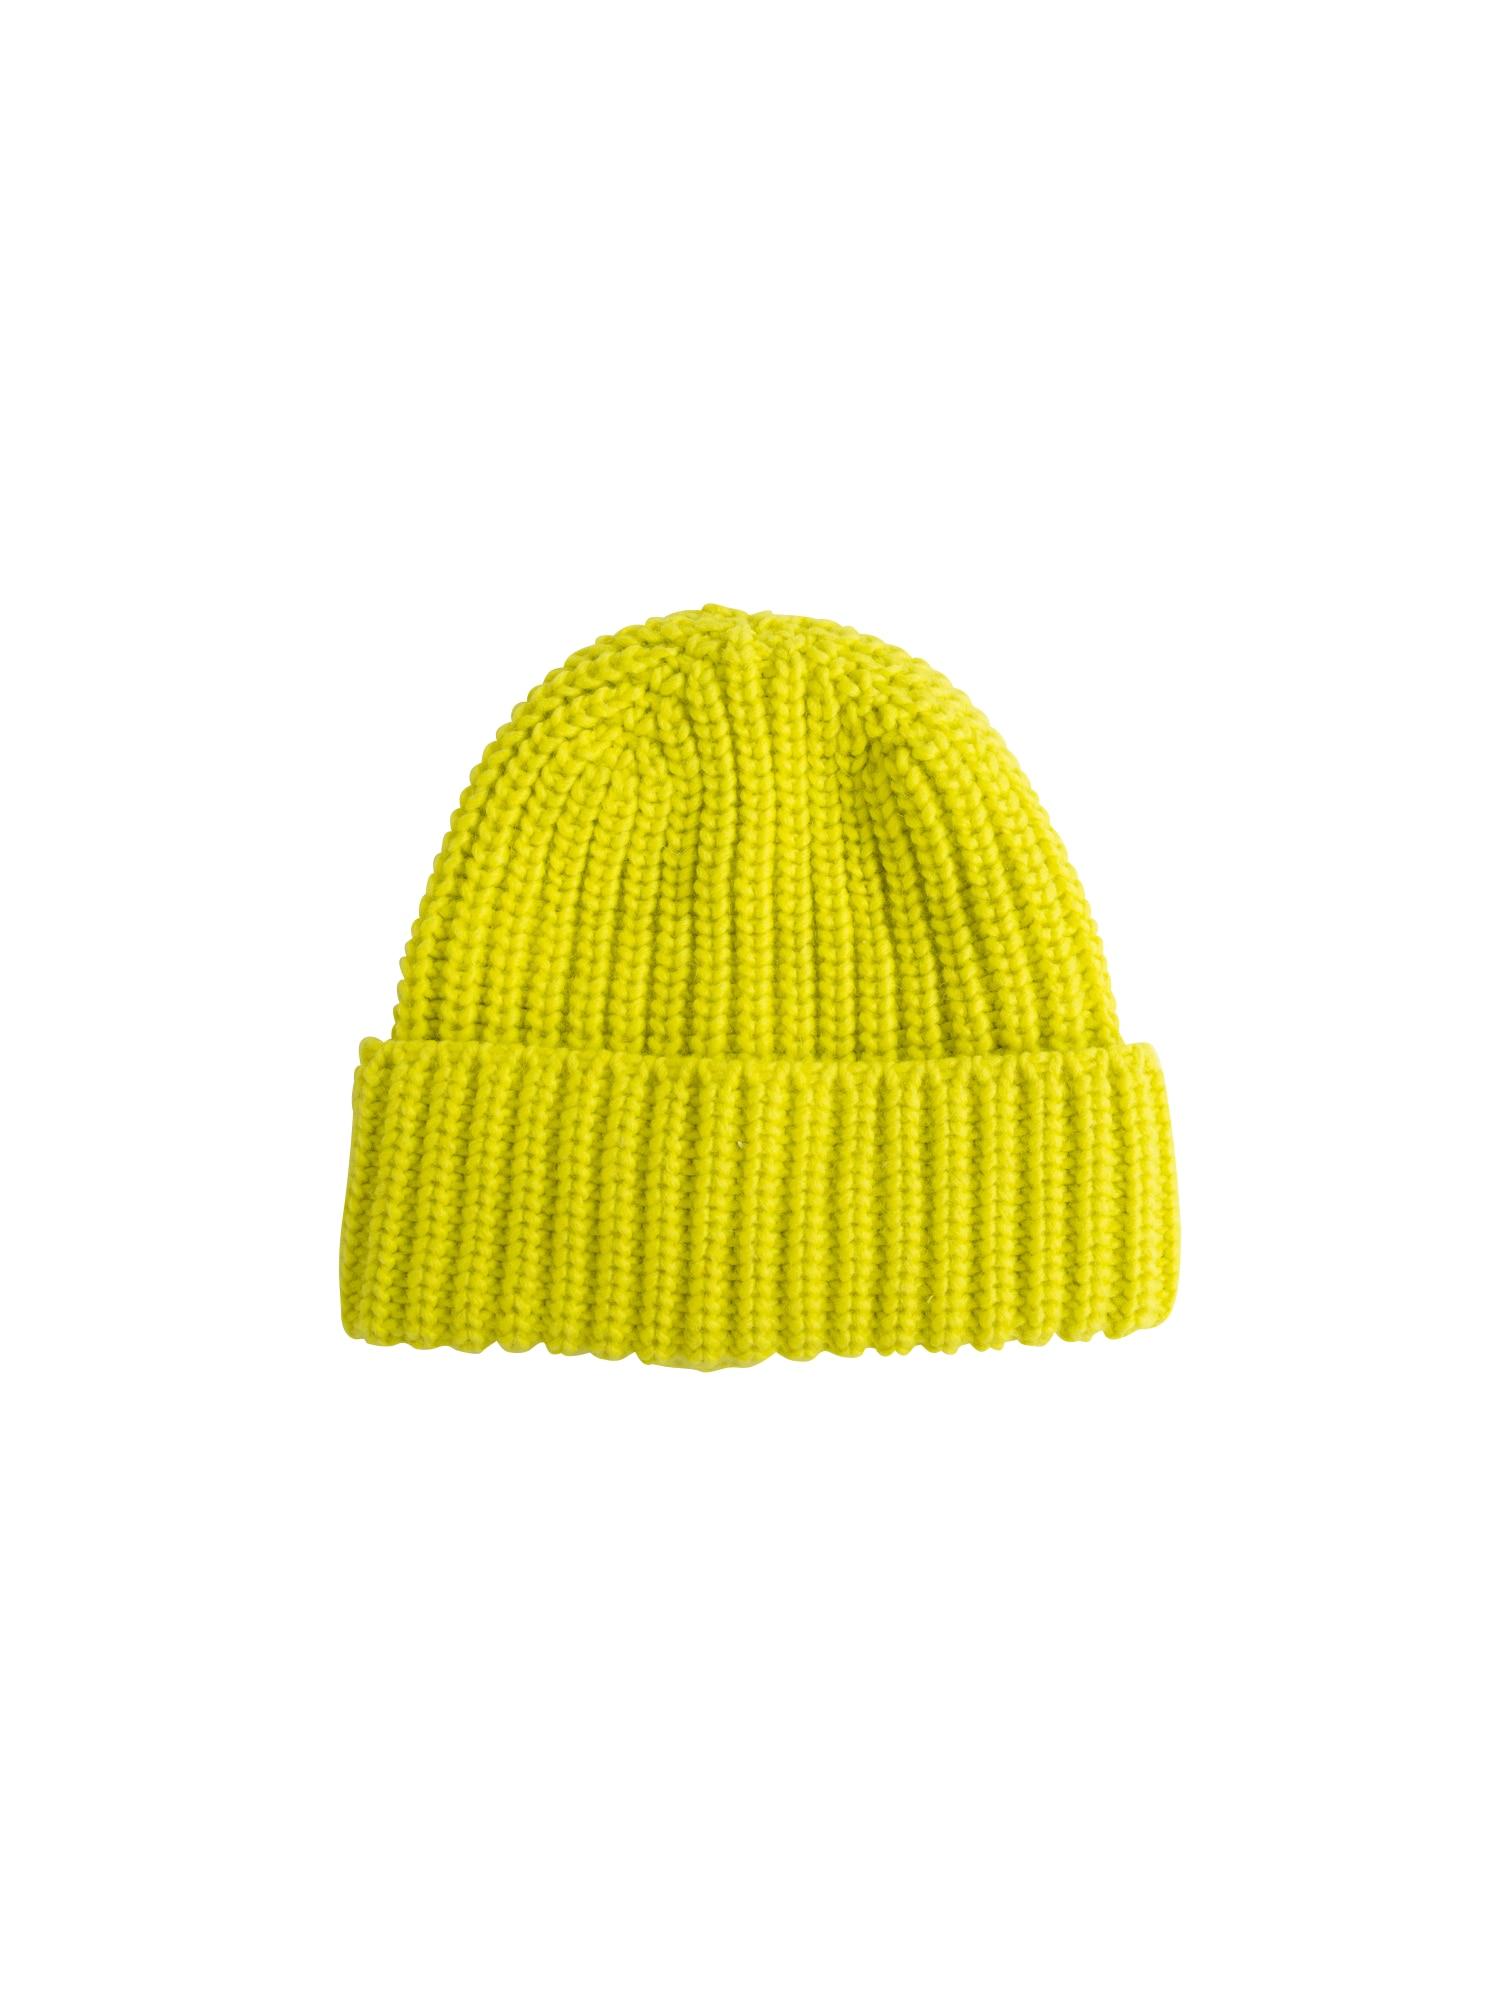 EDITED Megzta kepurė 'Grethe' geltona